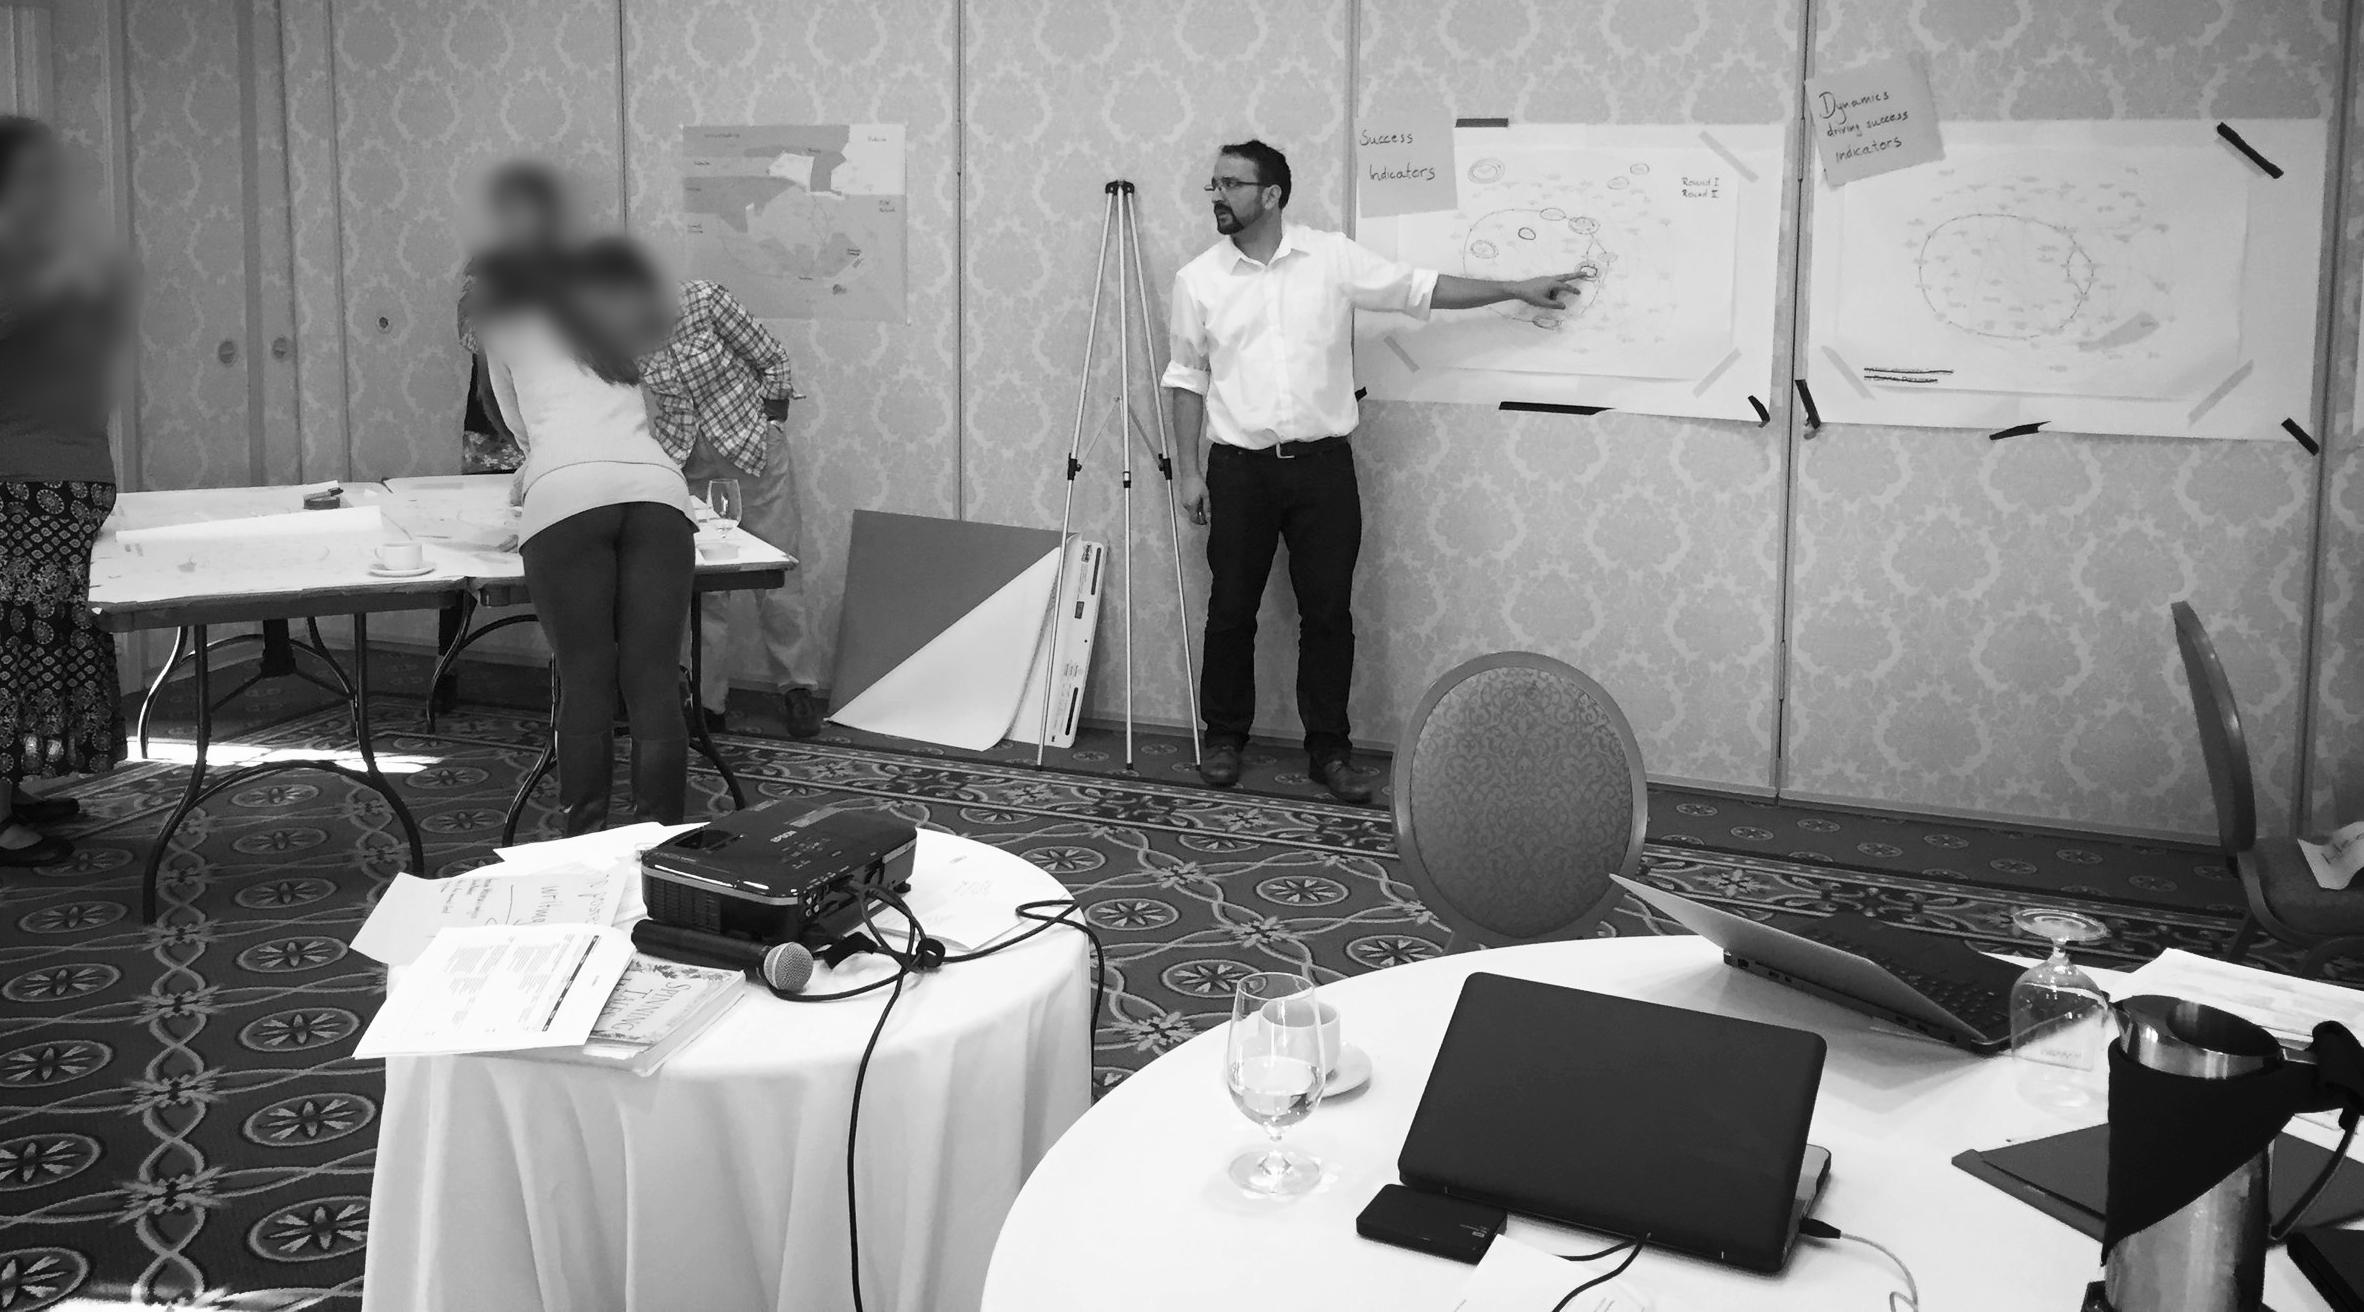 Facilitating the strategic design